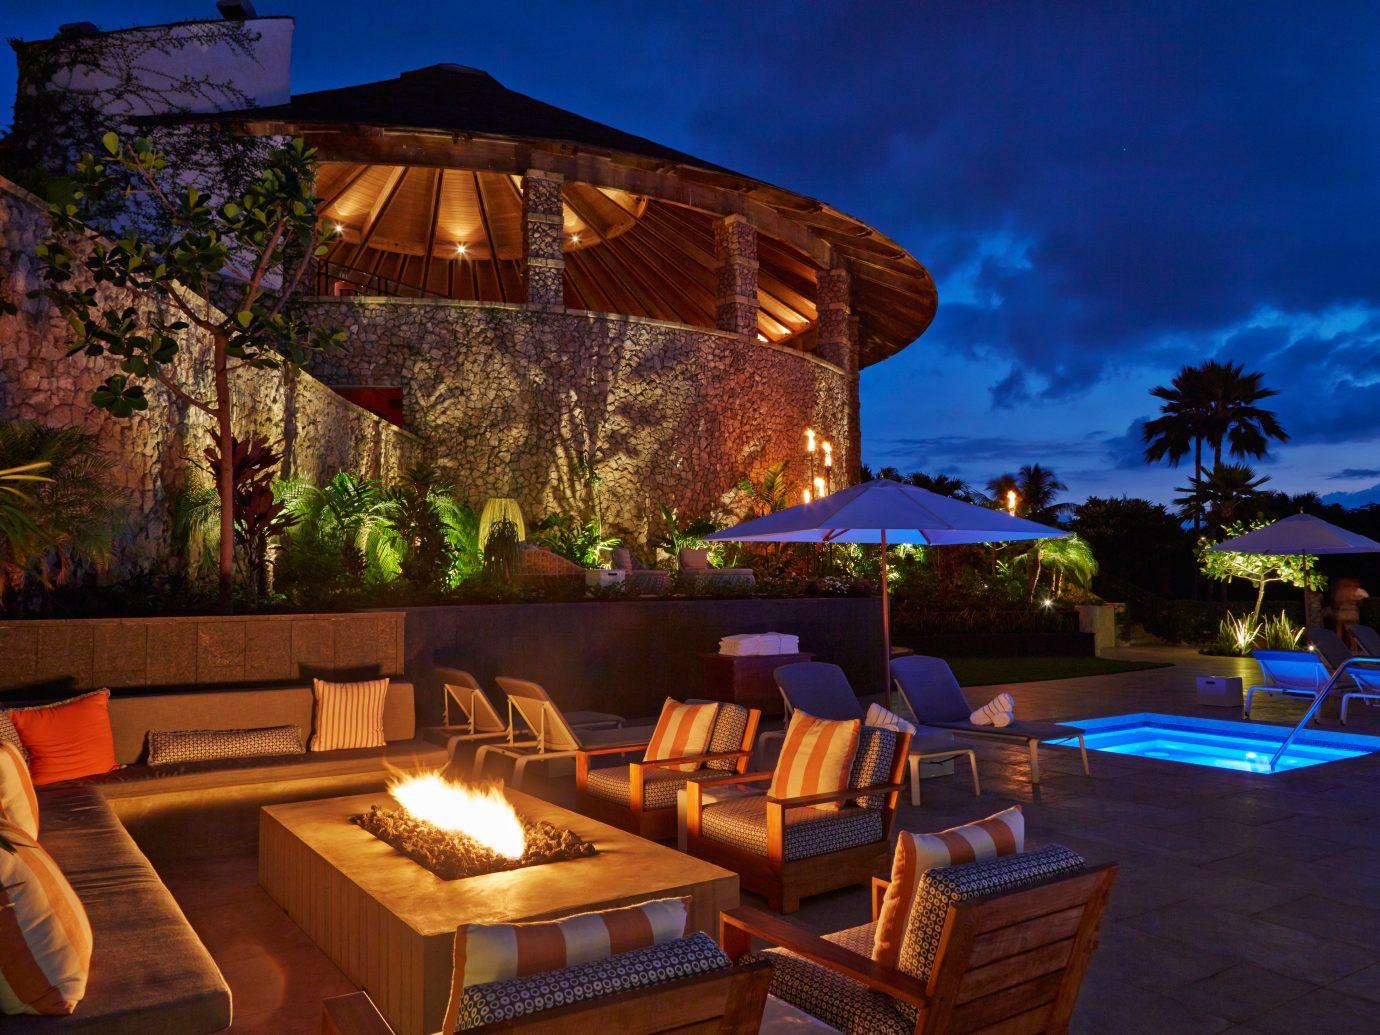 Beachfront Deck Eco Fireplace Hotels Island Lounge Patio Pool Romance Romantic Scenic views Sunset Waterfront outdoor Resort estate Villa landscape lighting swimming pool